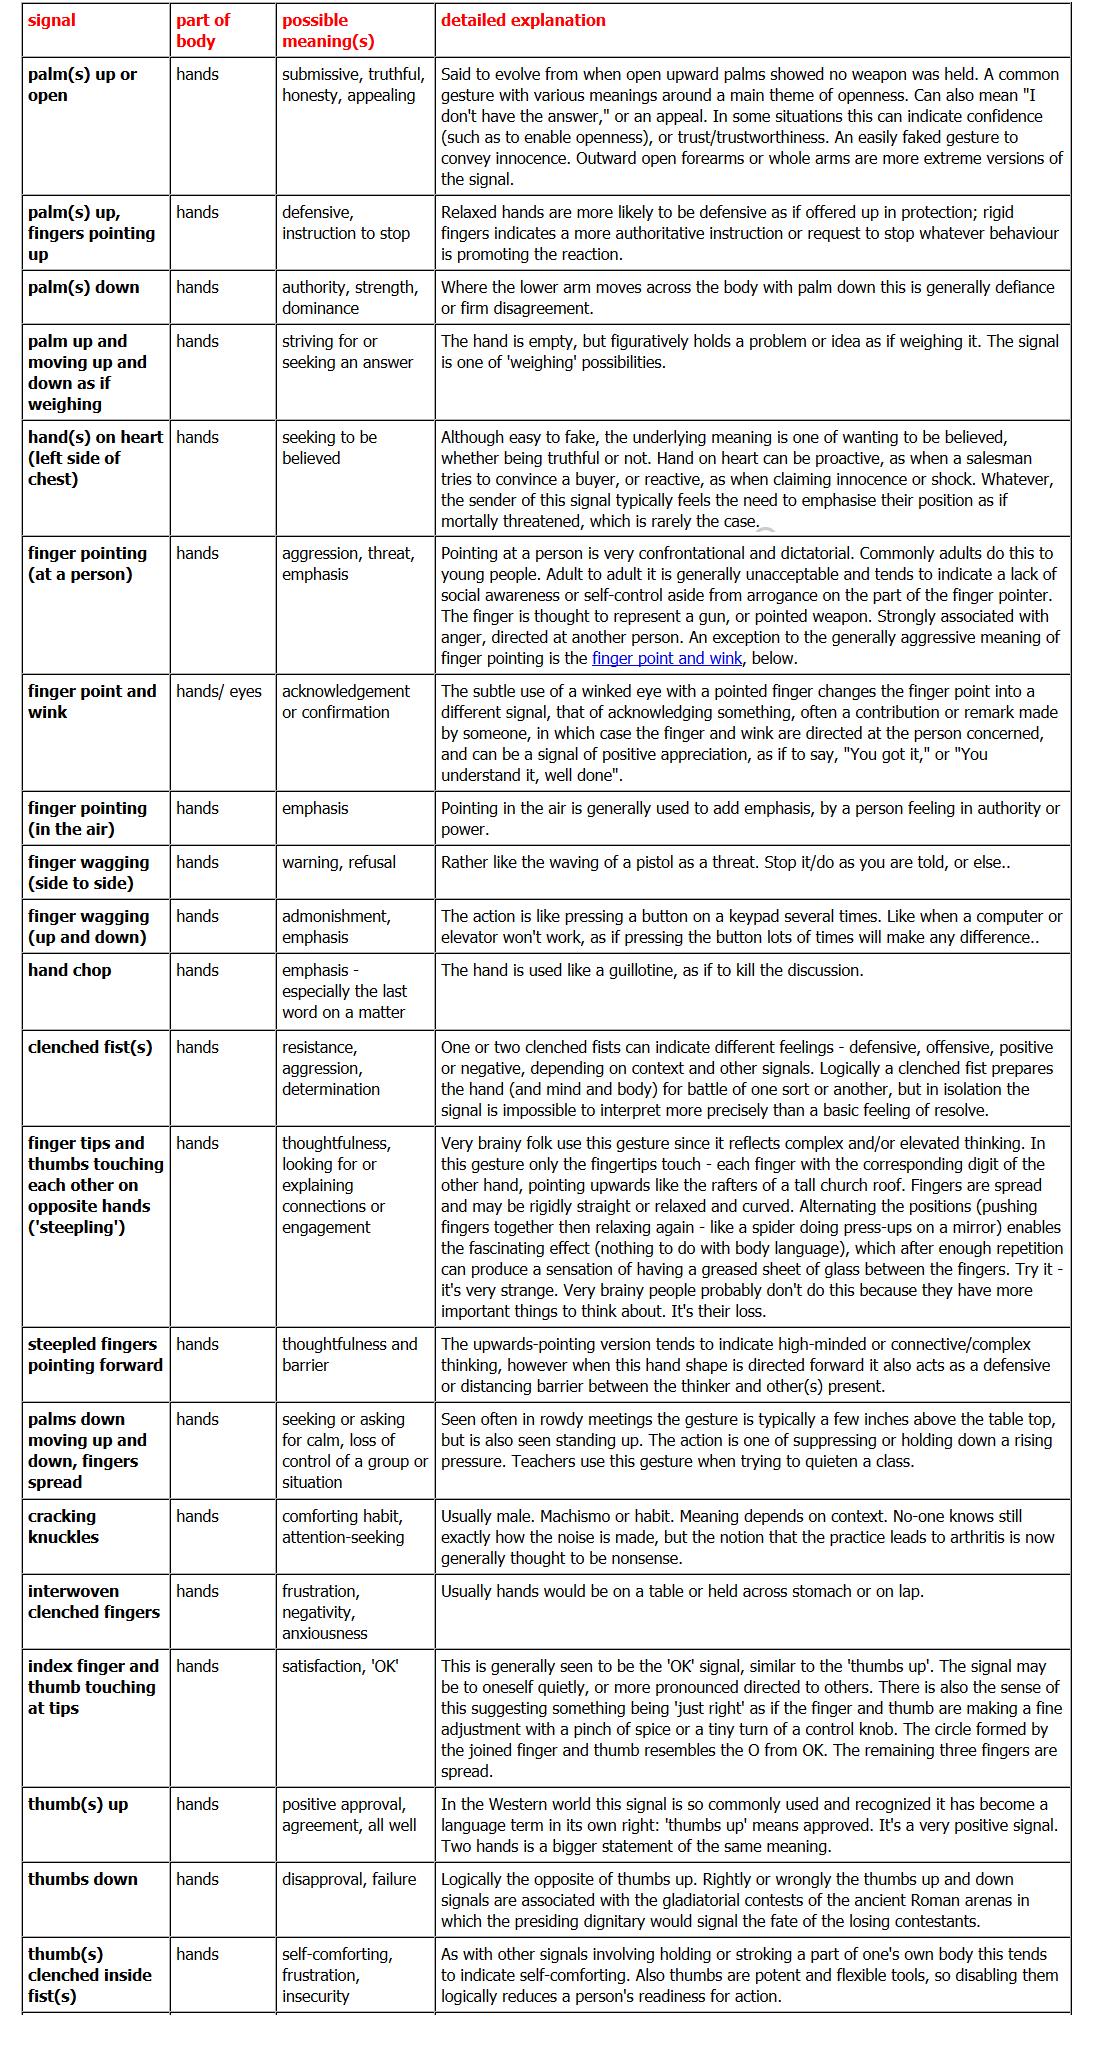 worksheet Body Language Worksheets hands body language part1 dialogue actions pinterest part1